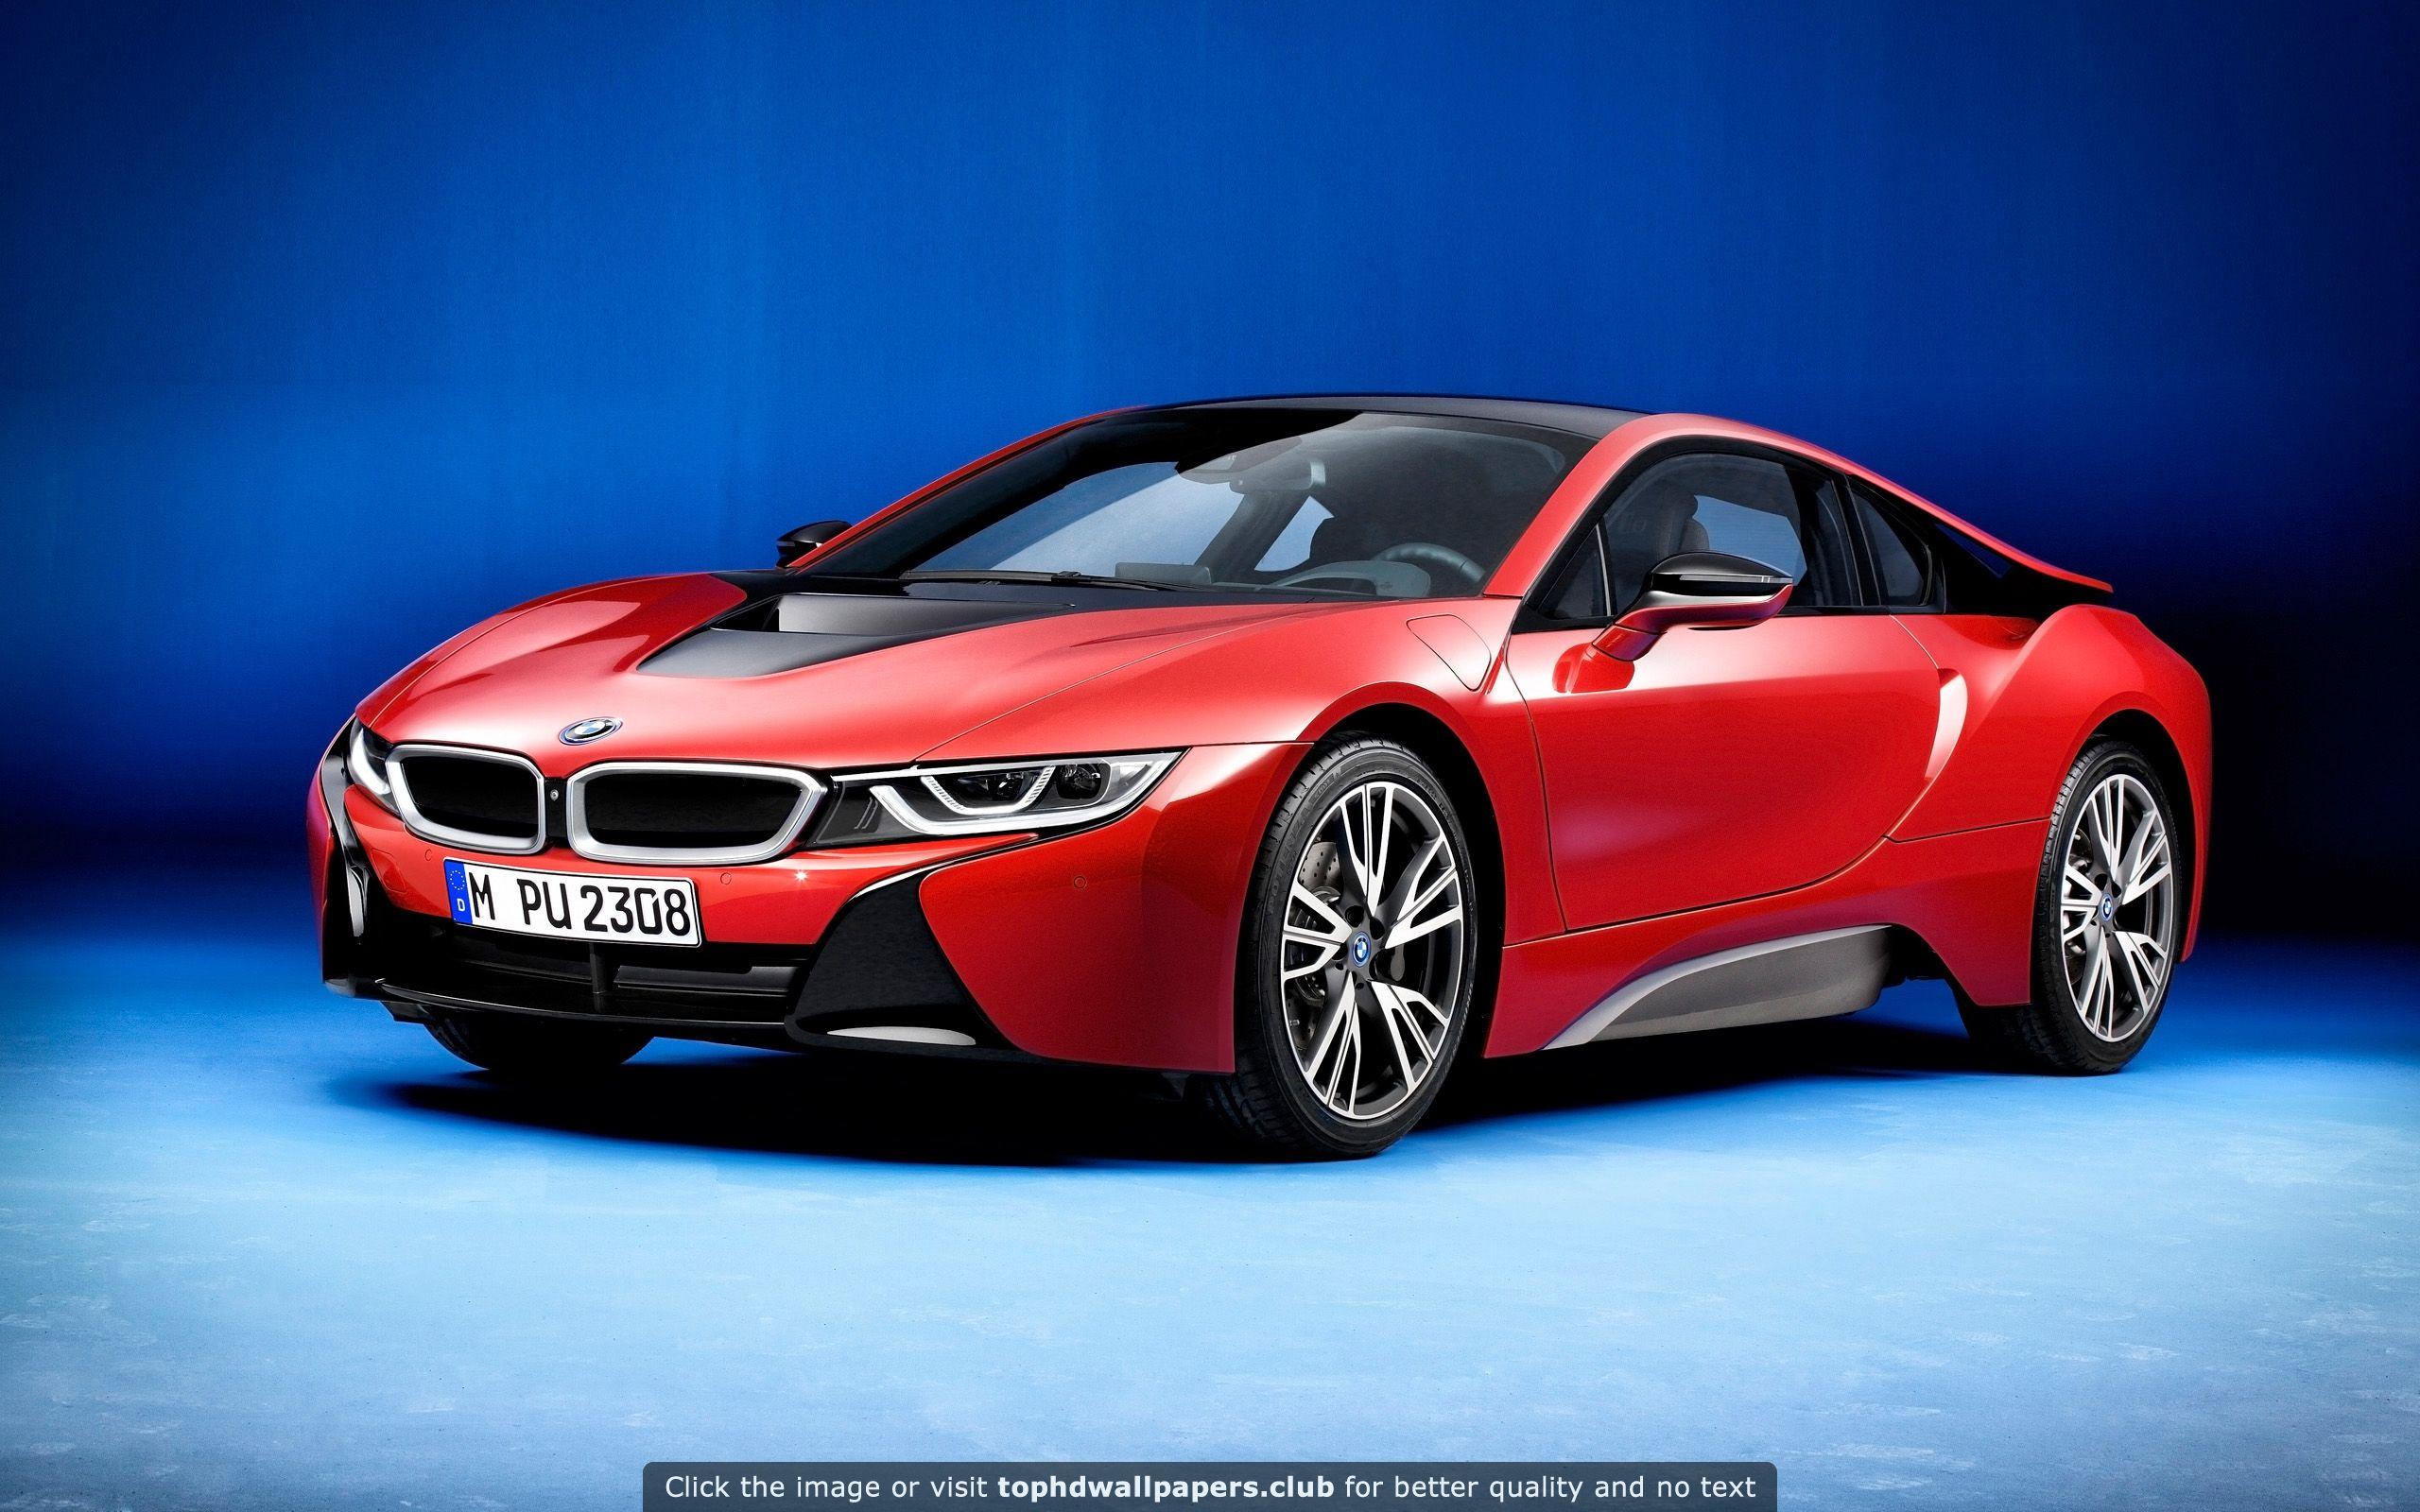 Bmw I Protonic Red Edition 2016 Hd Wallpaper Bmw I8 Red Bmw Bmw Sports Car